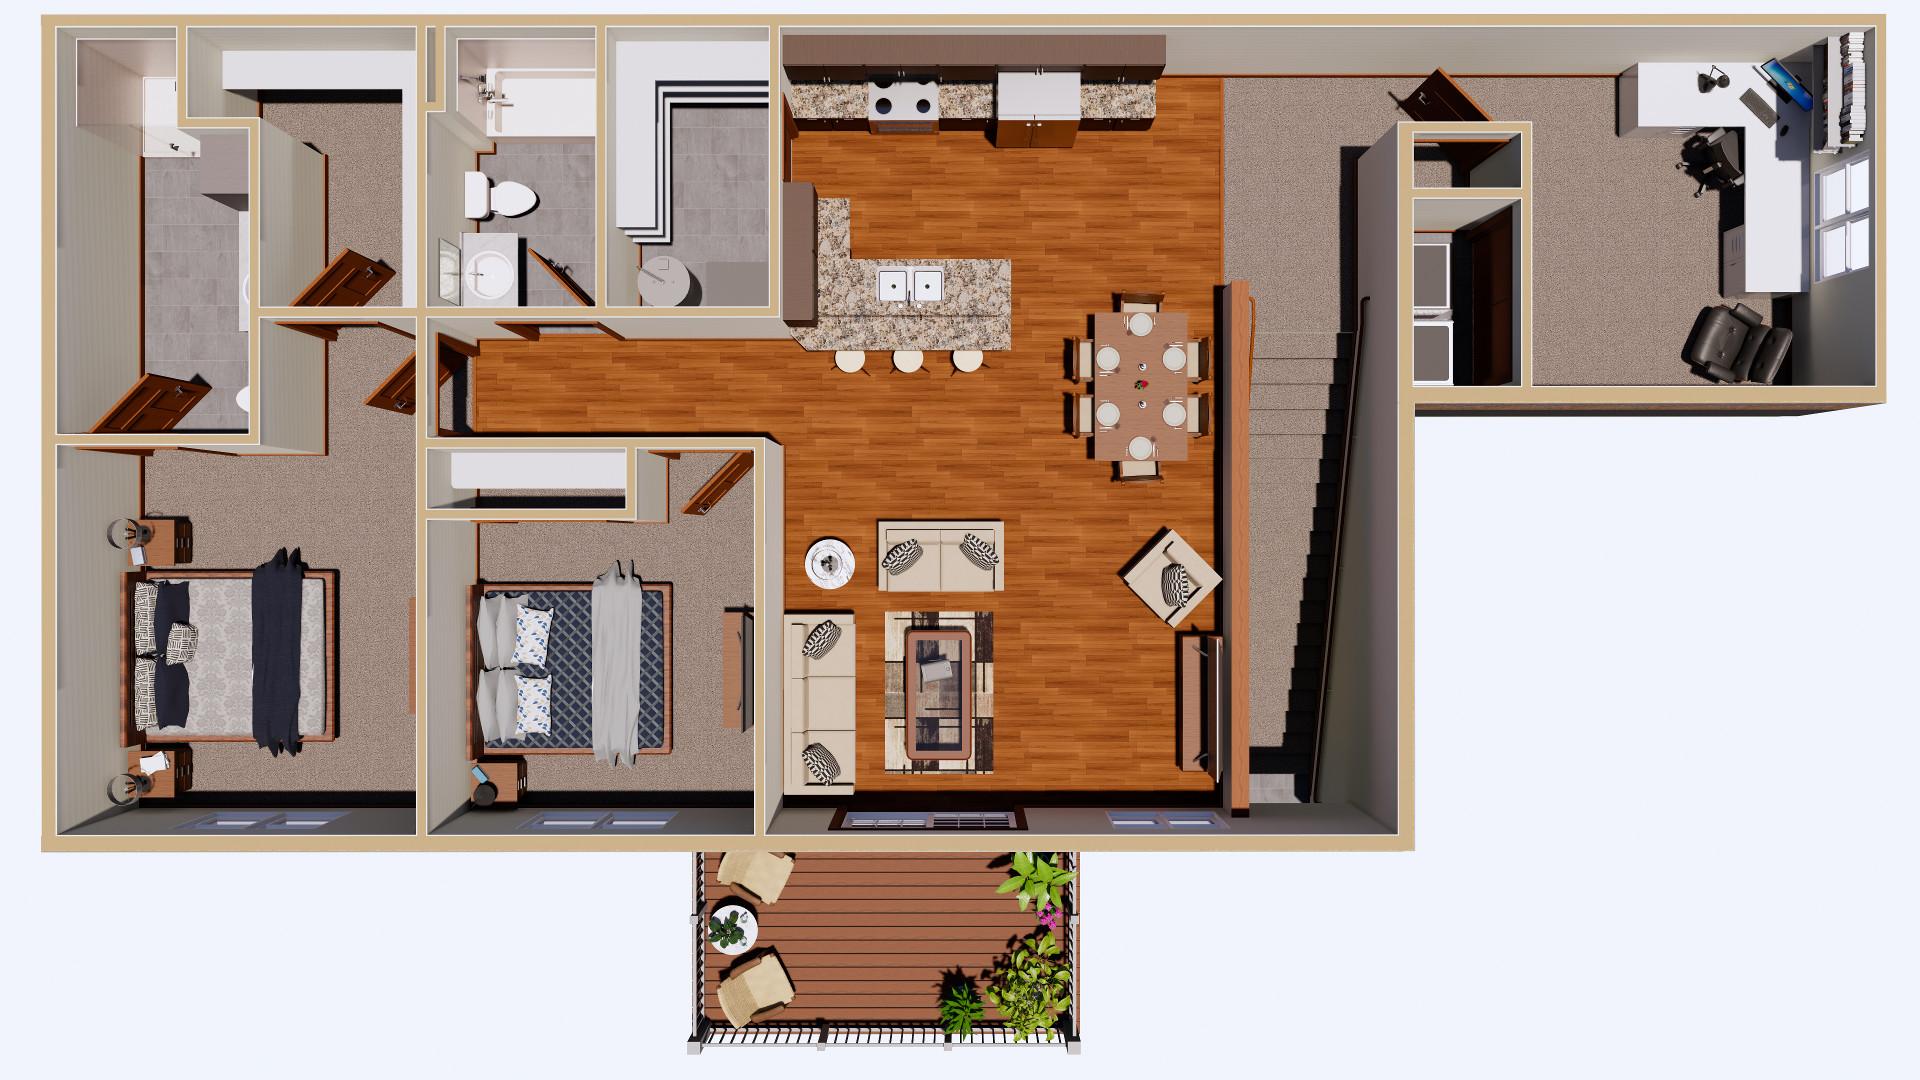 09-25-2020 Elk's Apartments 2nd Floor Rendering 2